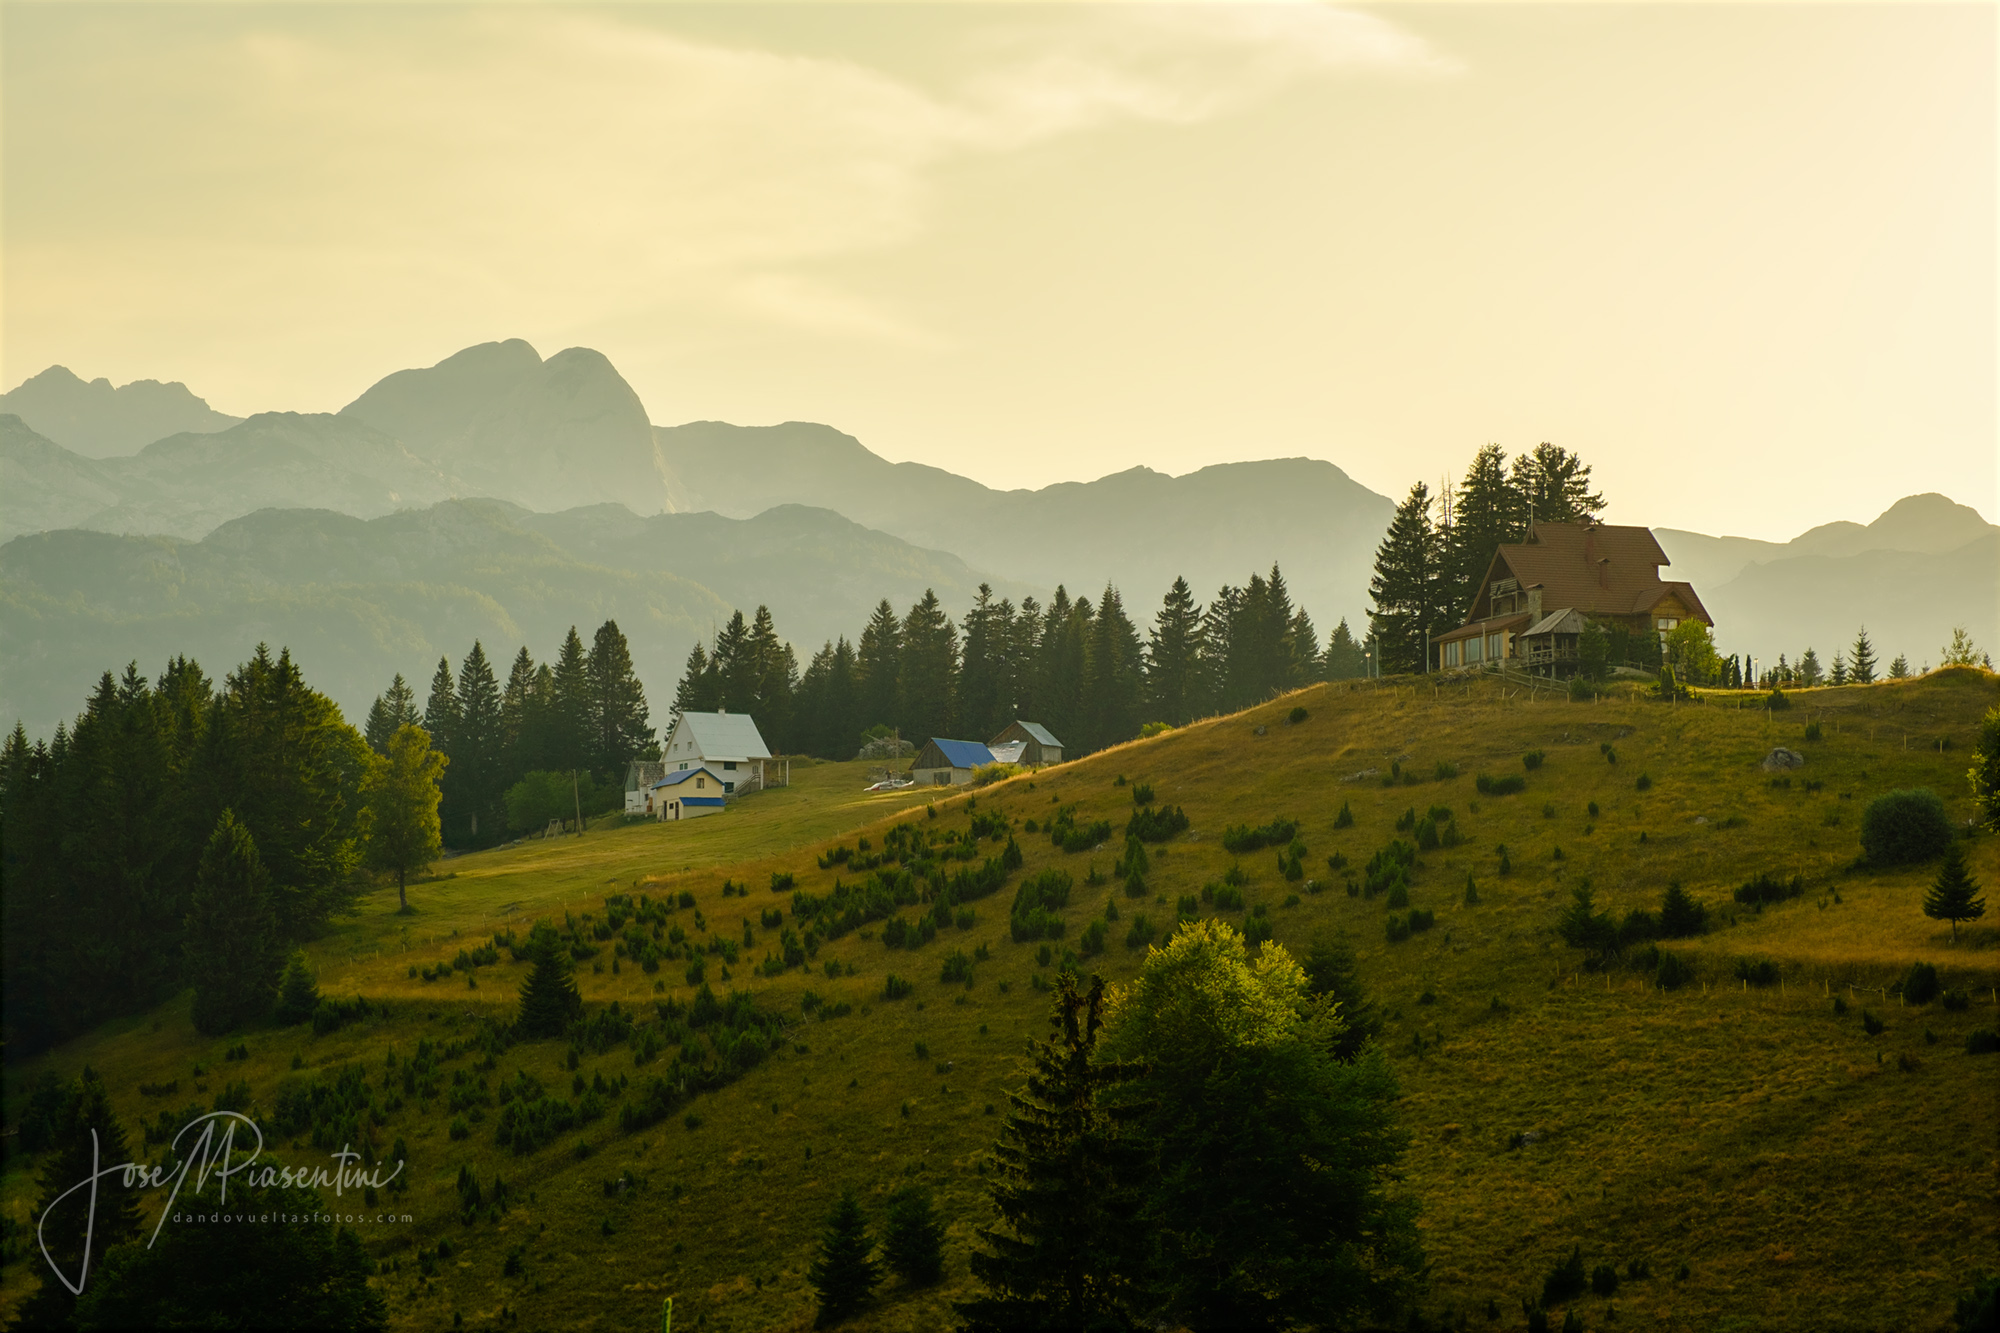 Parque Nacional de Durmitor Montenegro